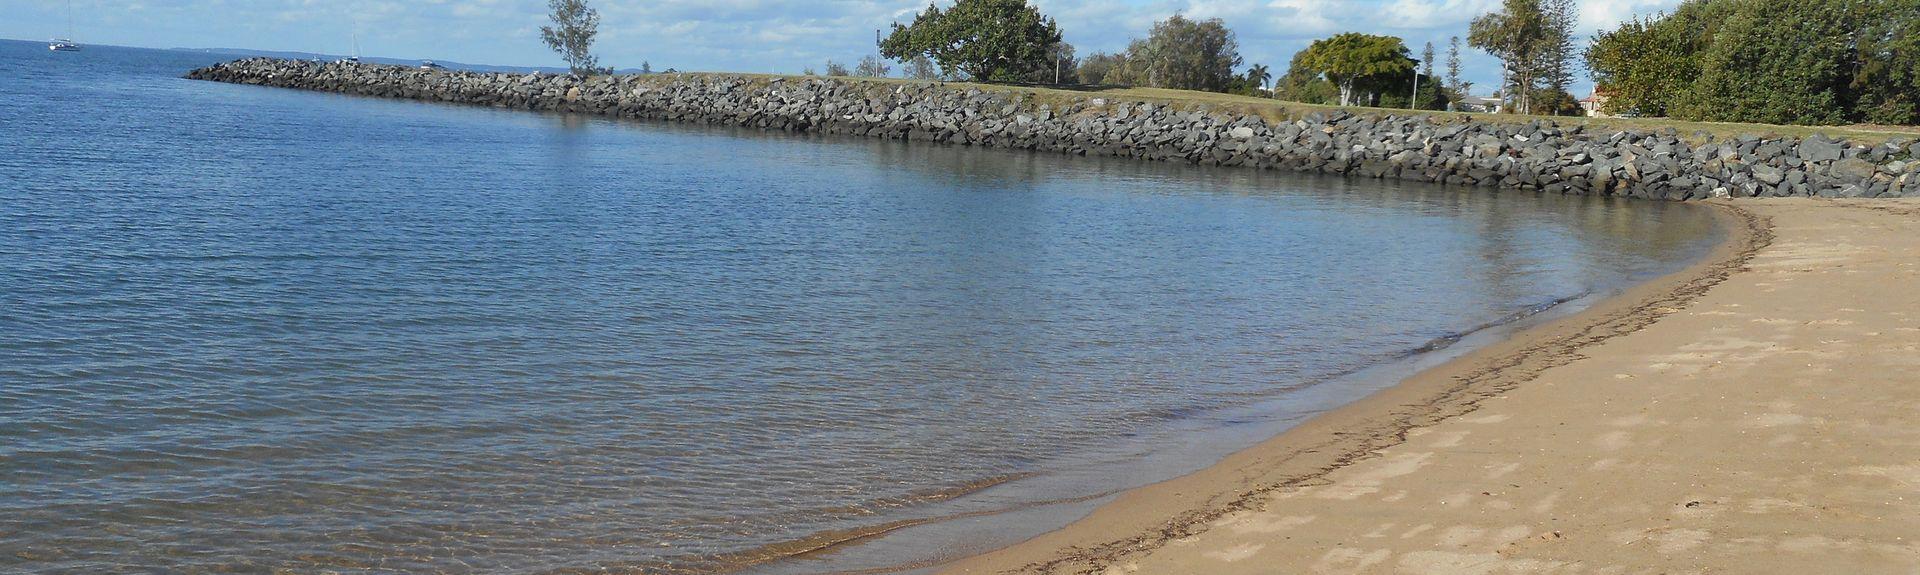 Macleay Island, Queensland, Austrália